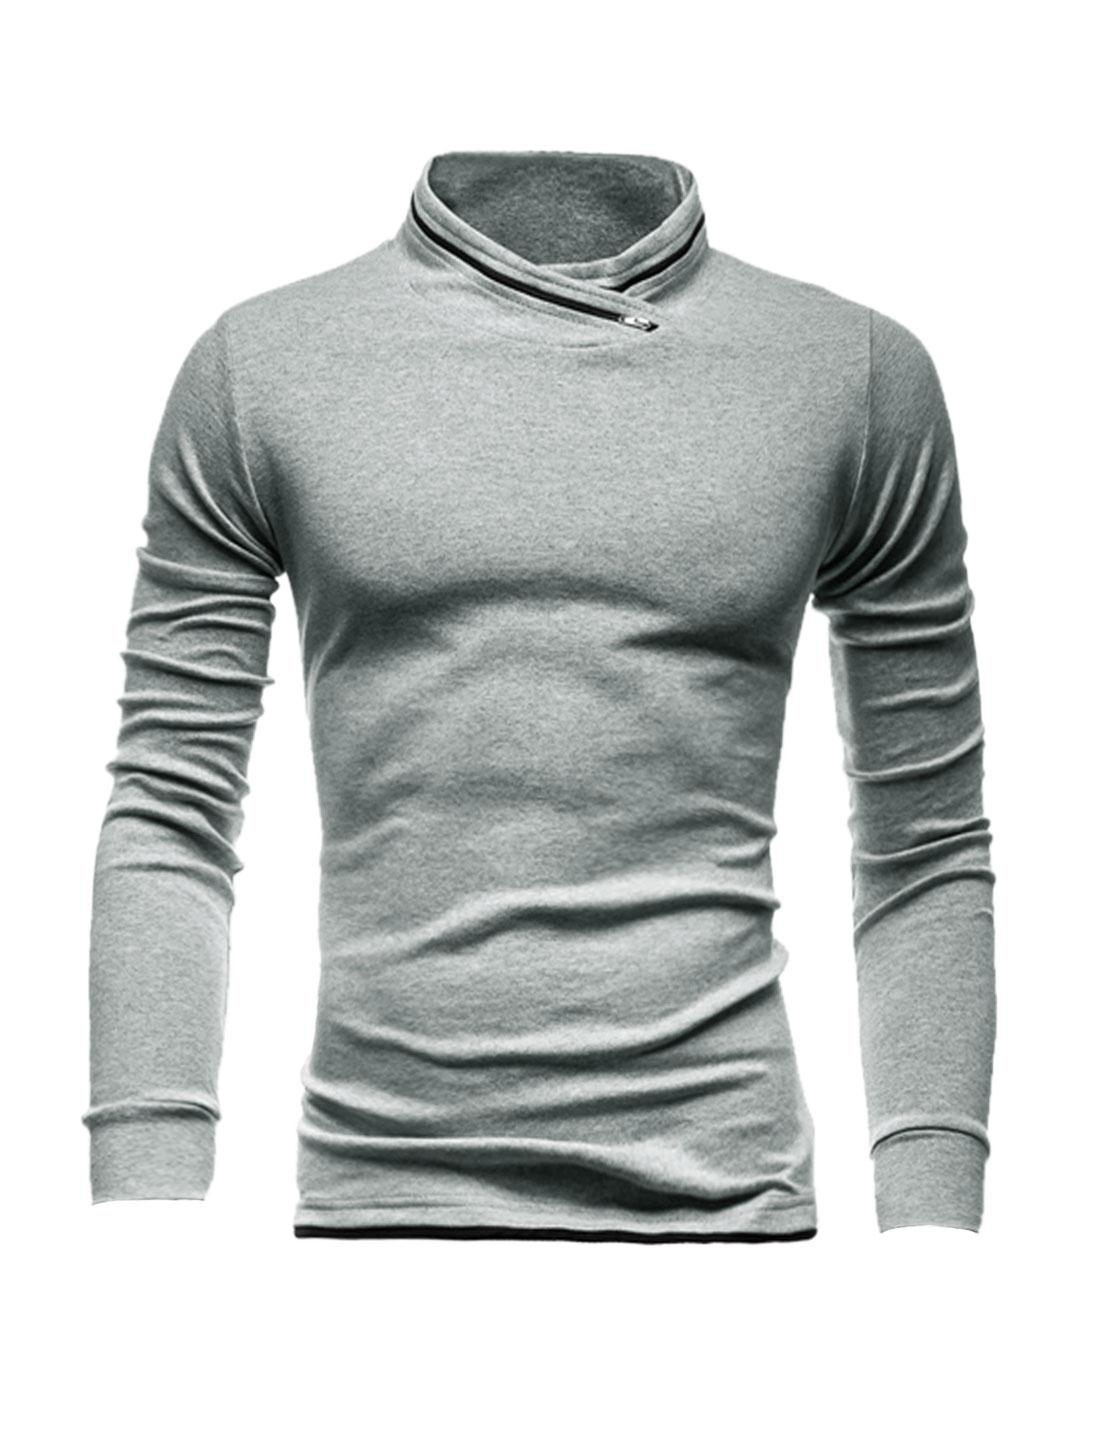 Men Zip Decor Stand Collar Long Sleeves Slim Fit T-Shirt Gray M